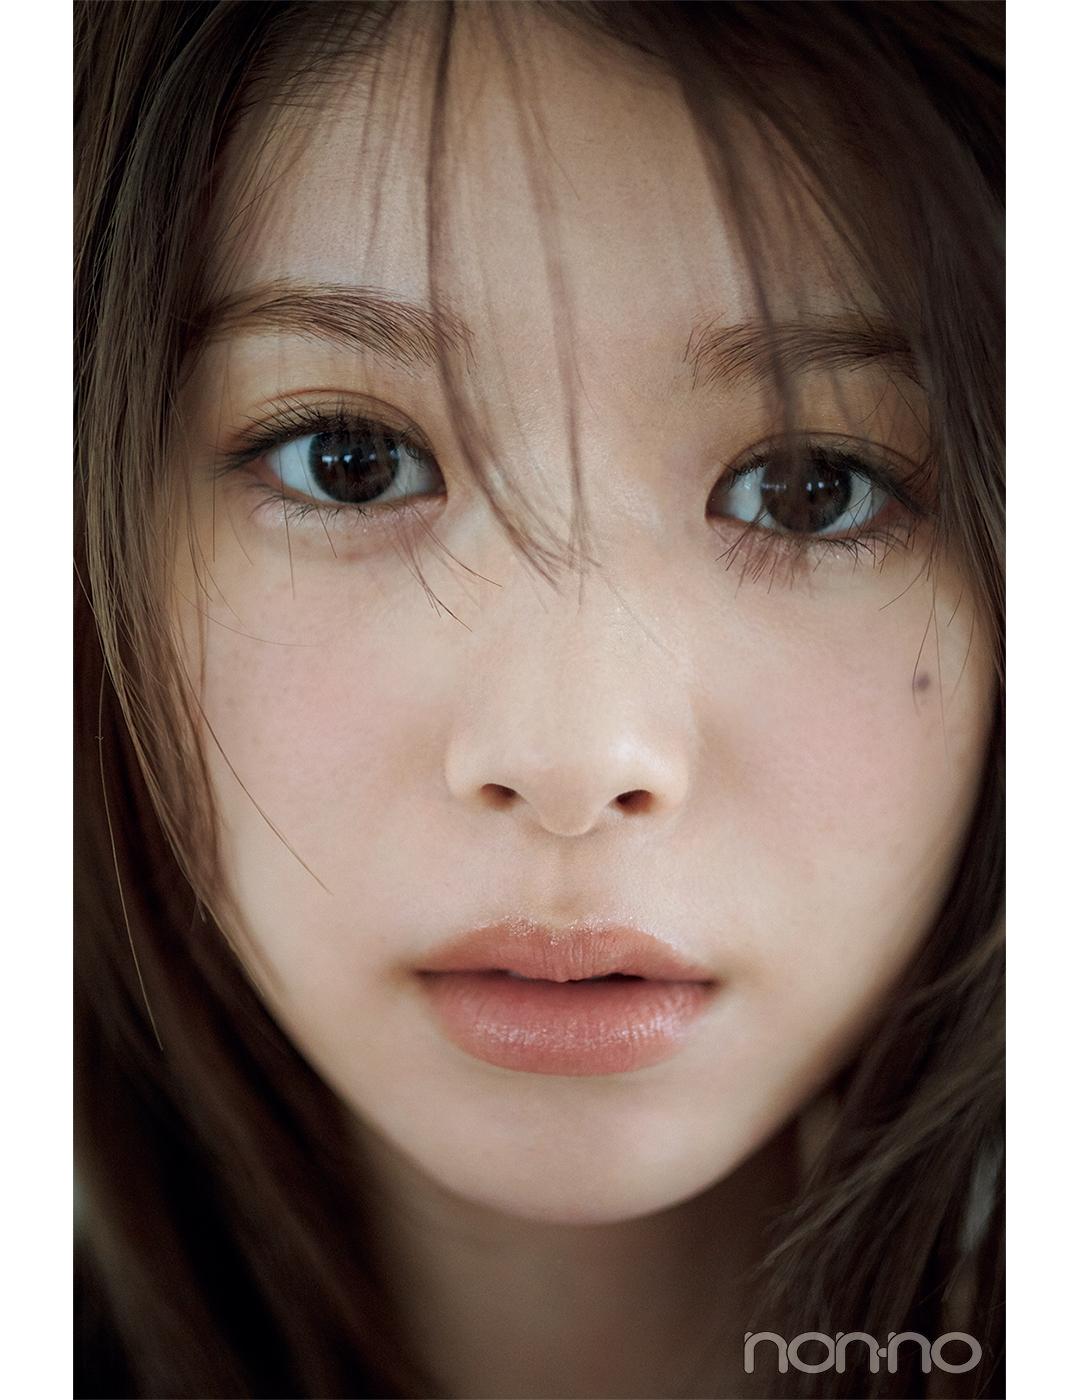 non-no 2021年6月号掲載『馬場ふみかのふみかける』 馬場ふみかがヘア&メイクアップアーティストの中野明海さんとコラボ!